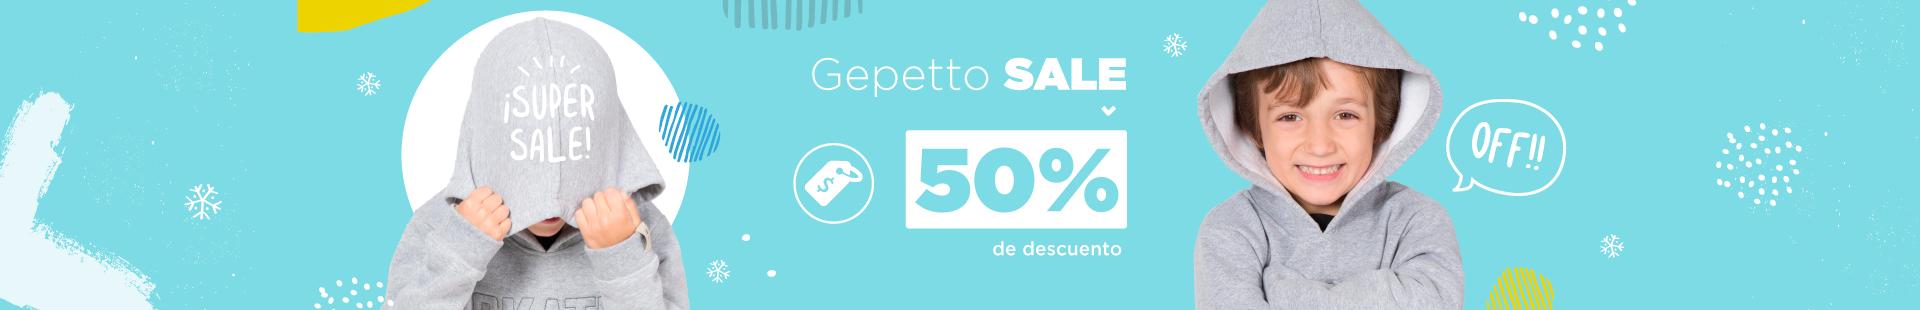 Slider Sale 50%